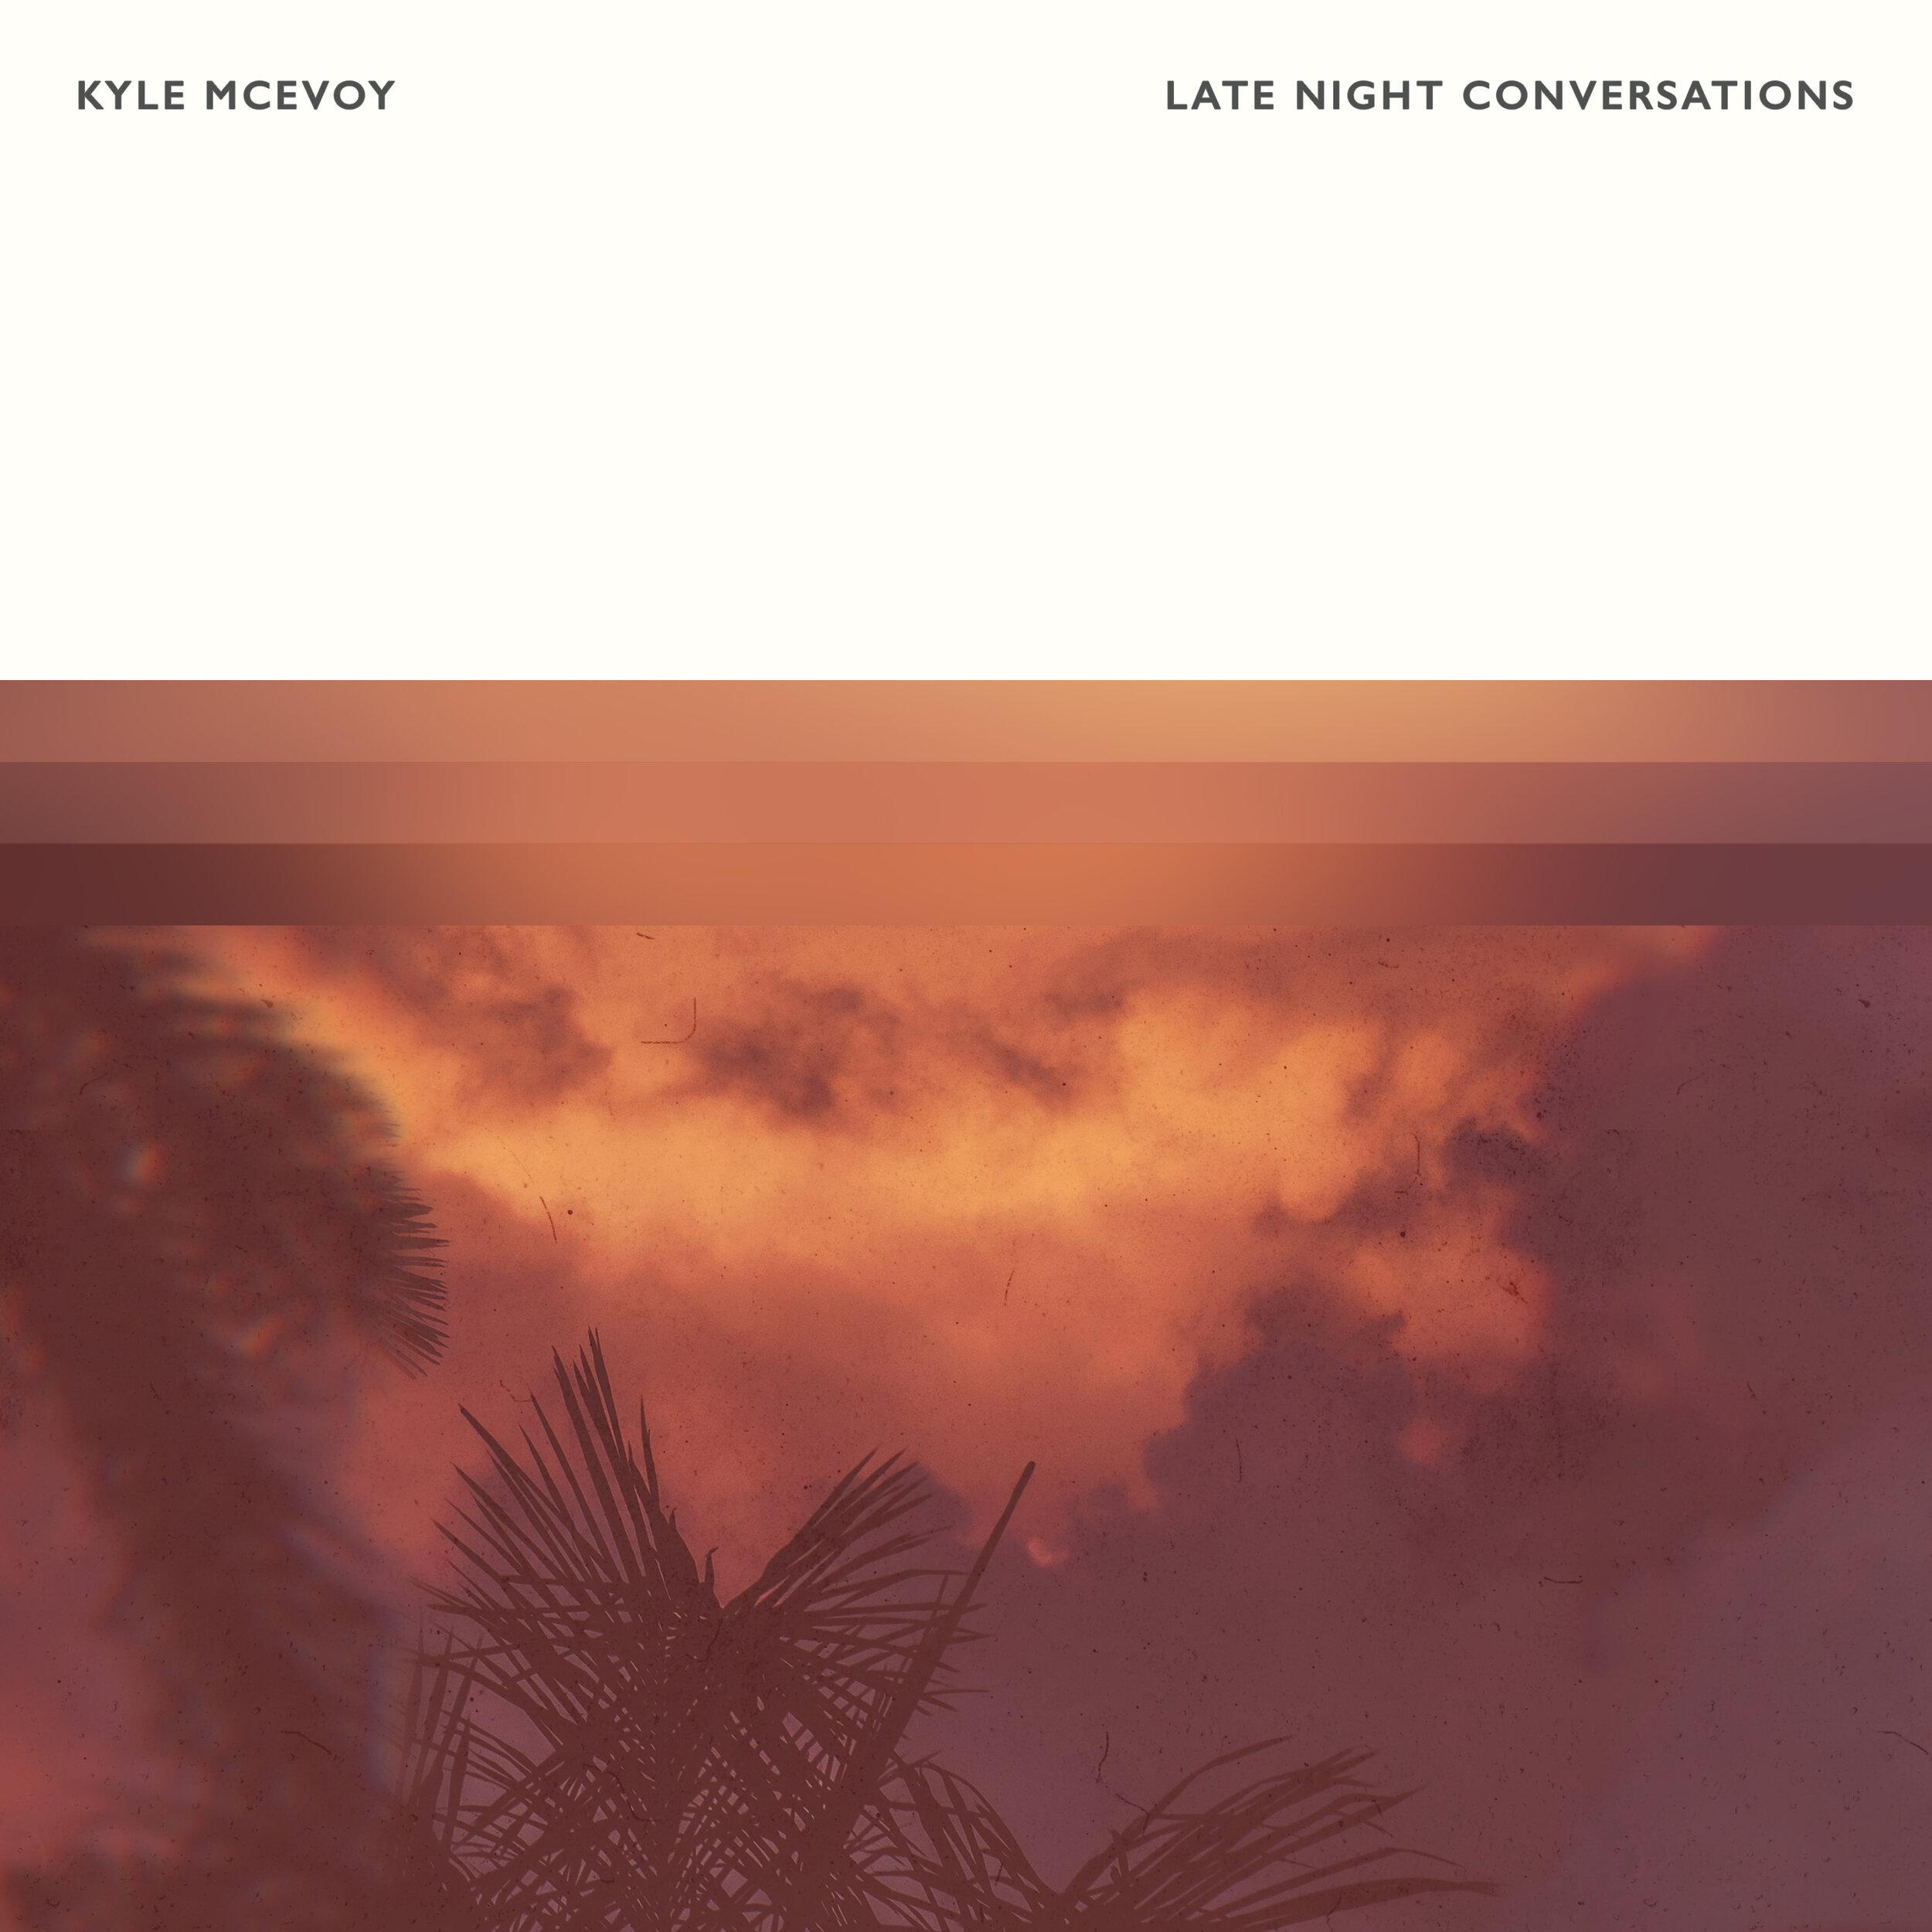 Kyle McEvoy - Late Night Conversations